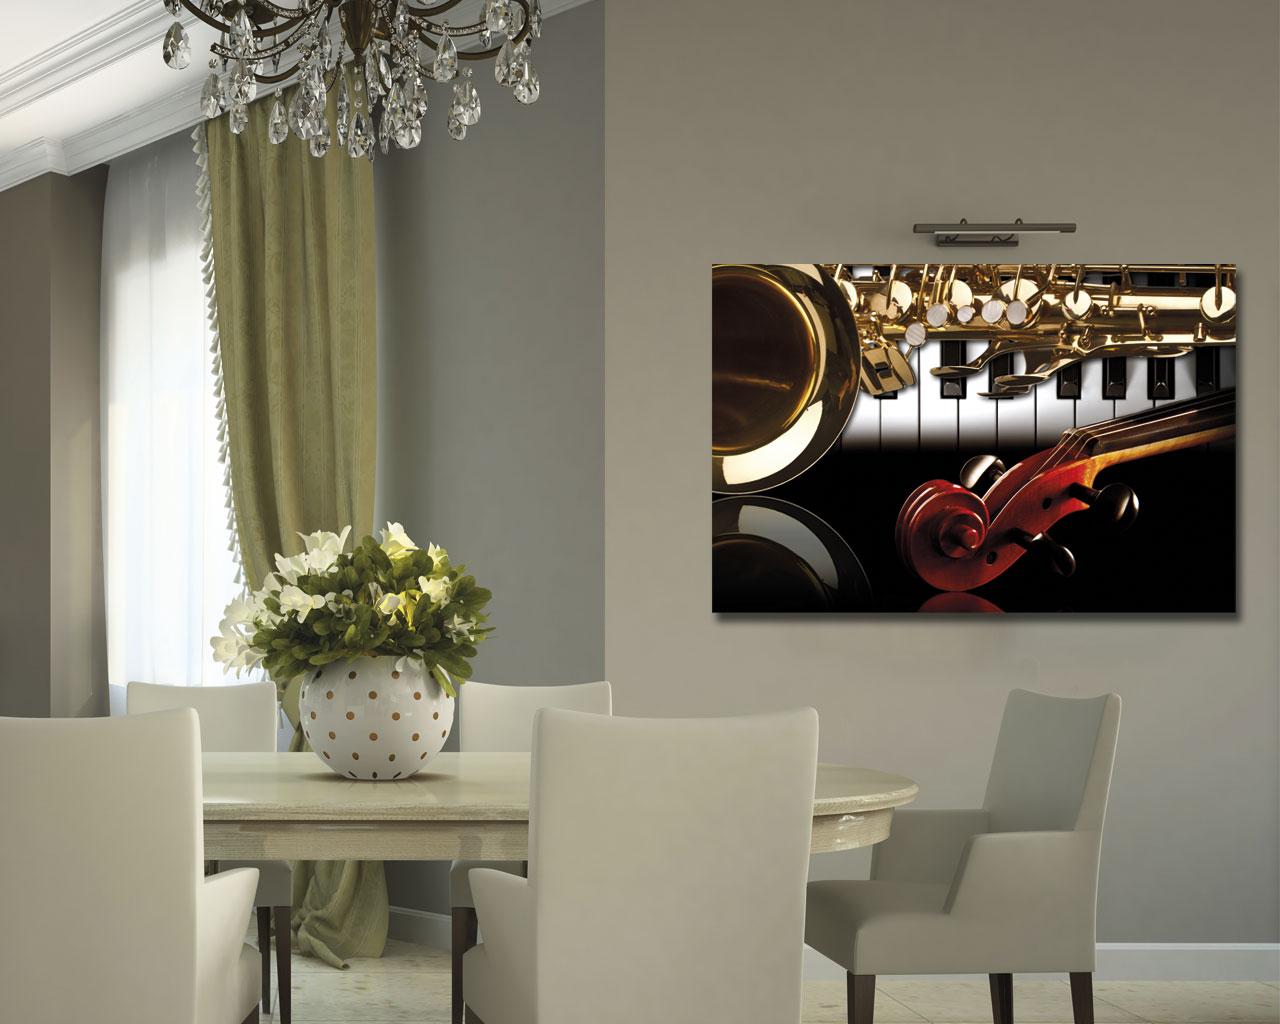 Strumenti musicali vintage retr stampa su tela - Quadri per sala da pranzo ...